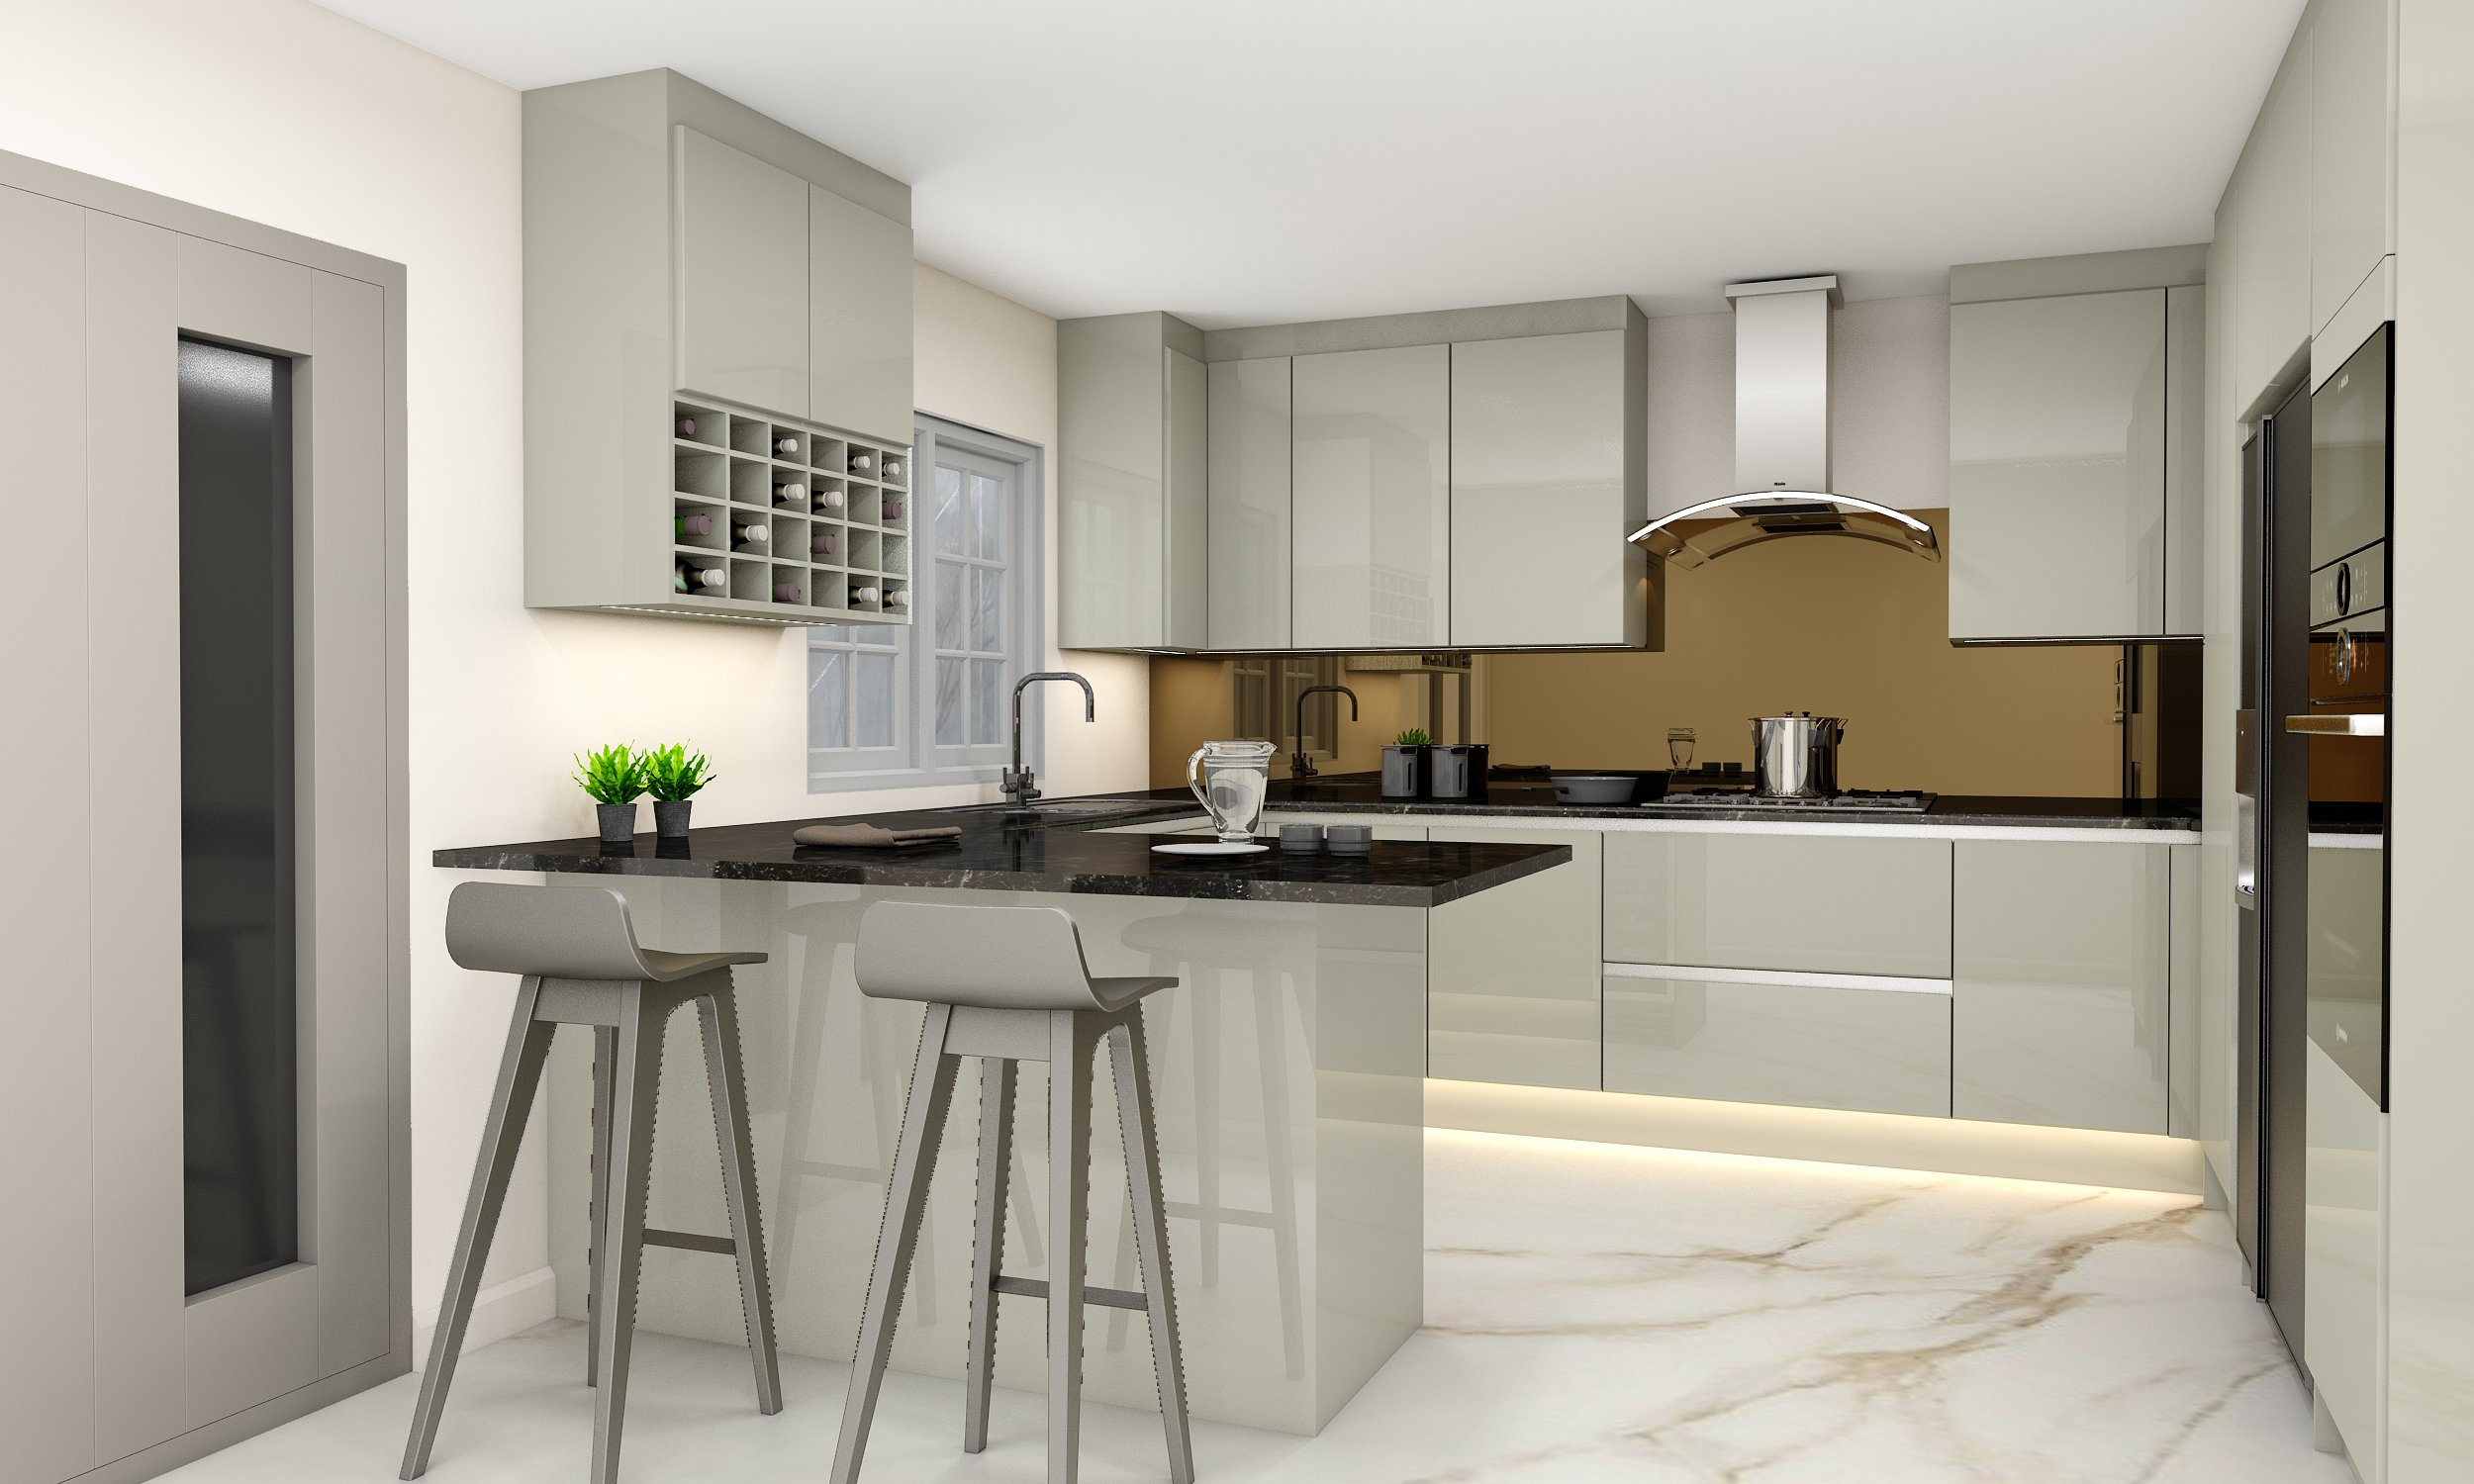 Handleless G Shape Kitchen in Silver Handle Profile With High Gloss Khaki Grey Finish